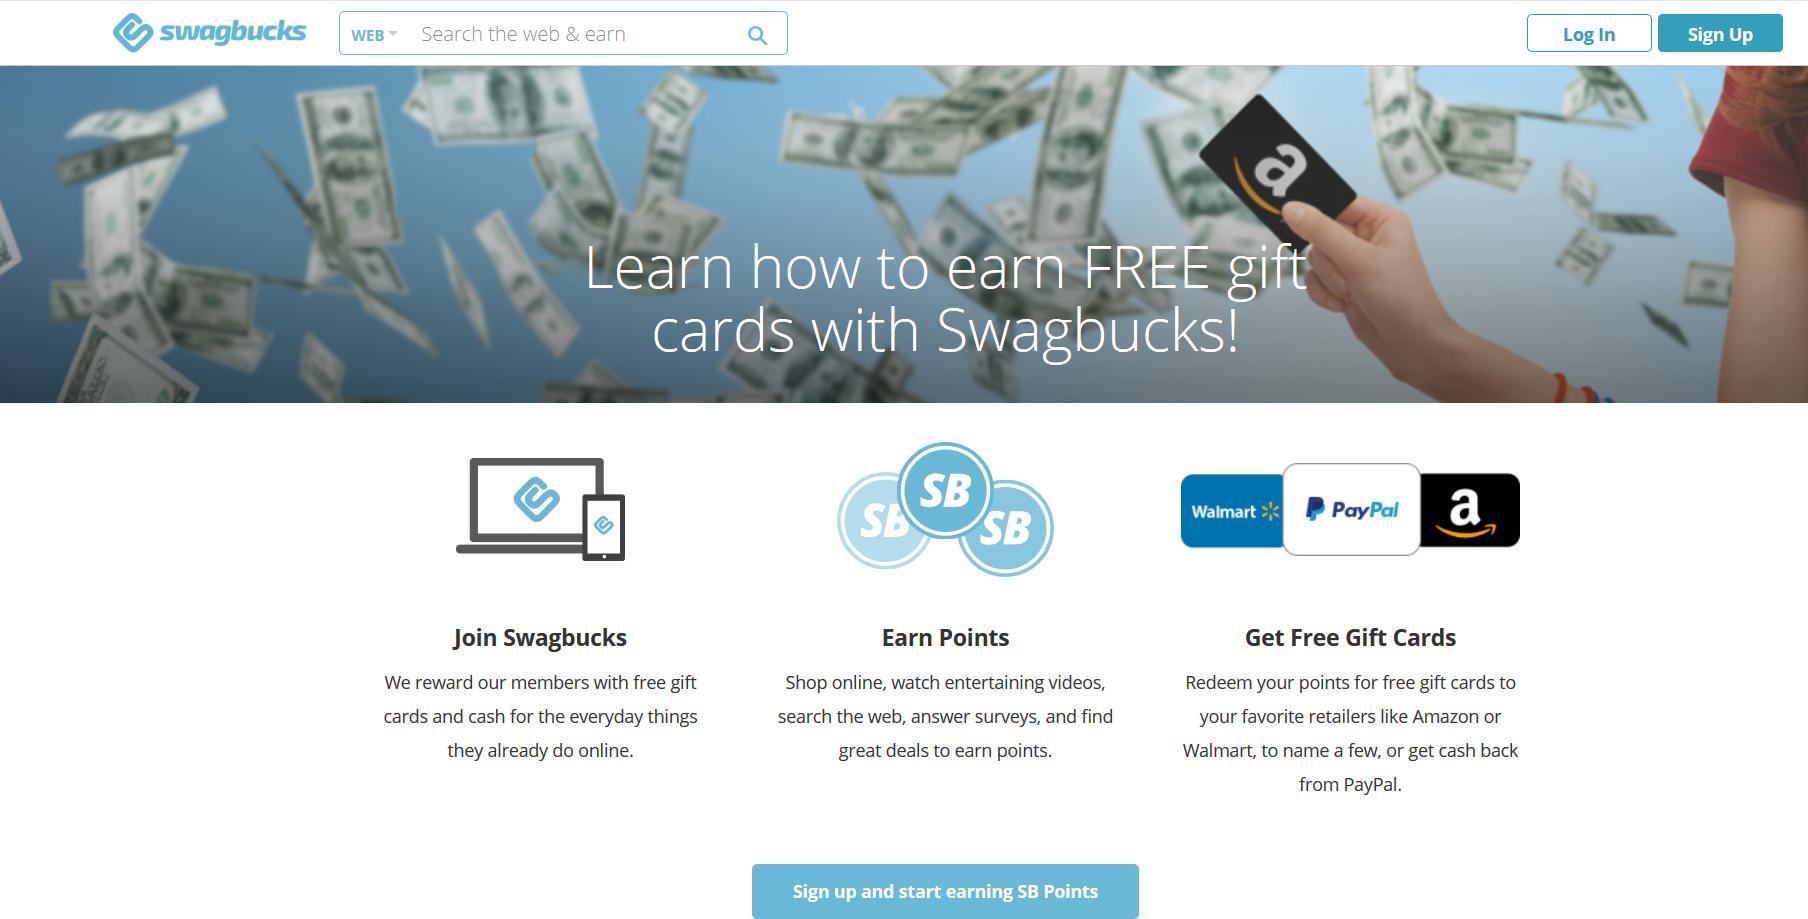 swagbucks review - wie es funktioniert